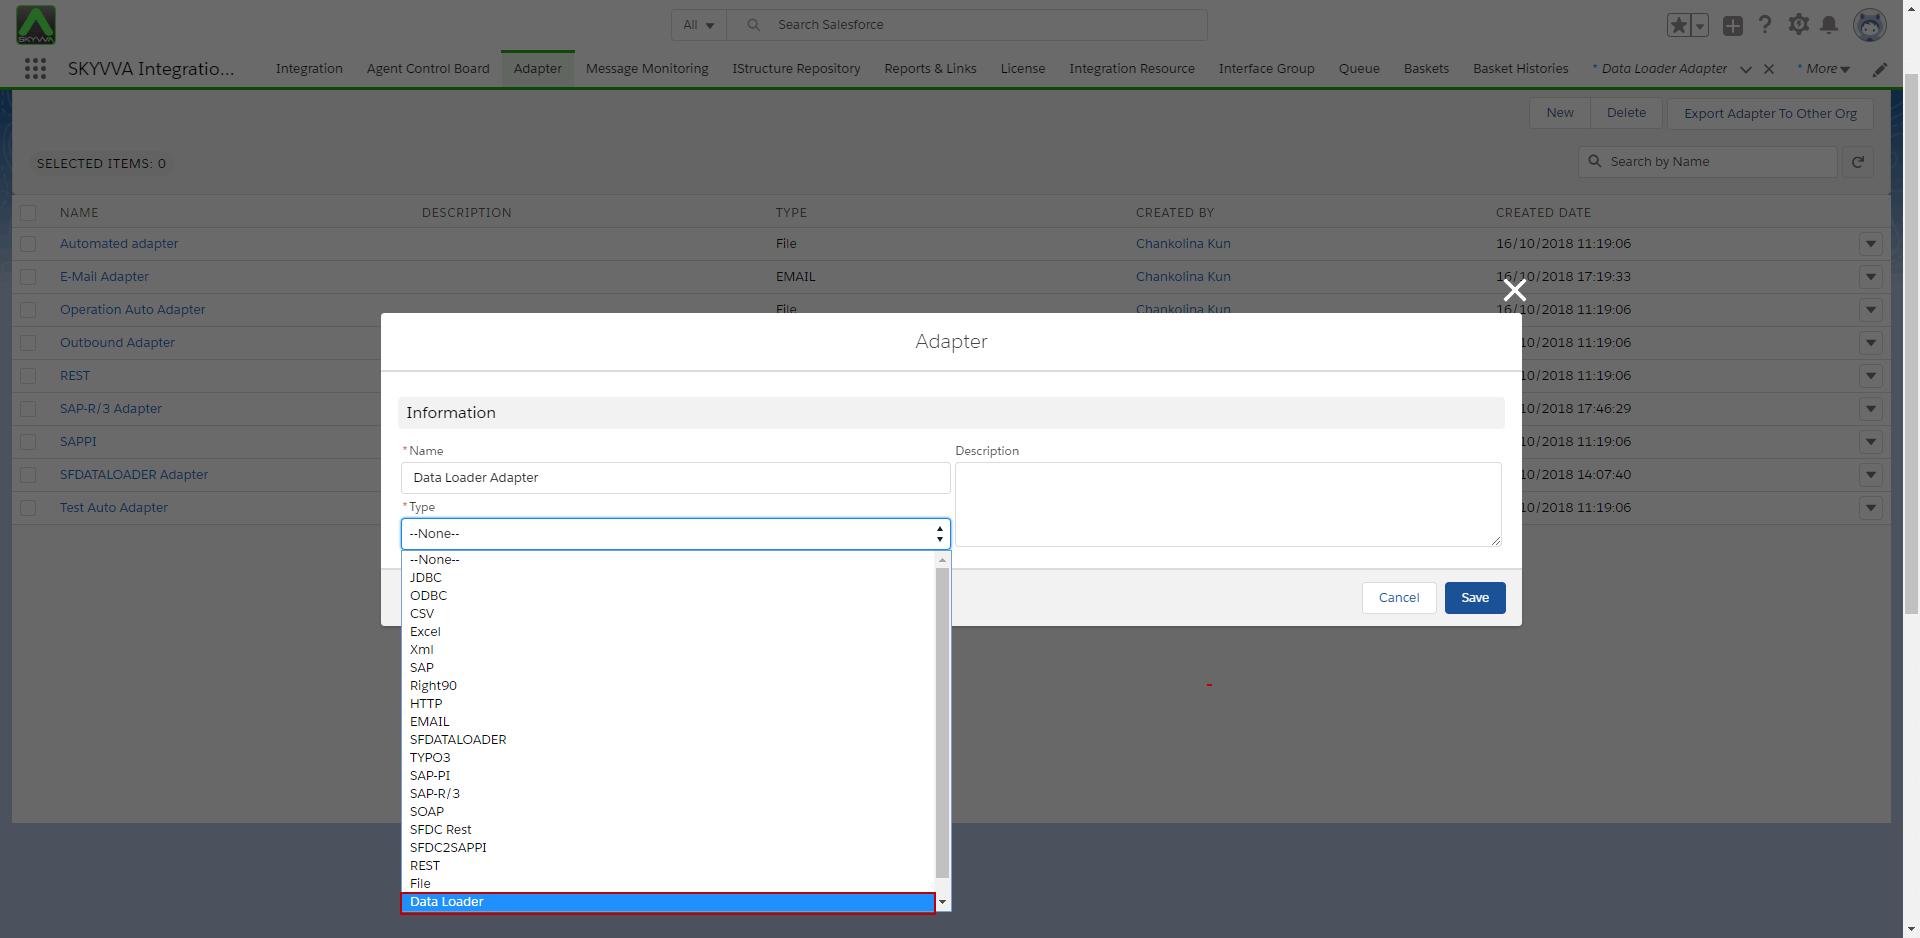 7 3 Data Loader Adapter – SKYVVA (Salesforce SAP, SAP-PI